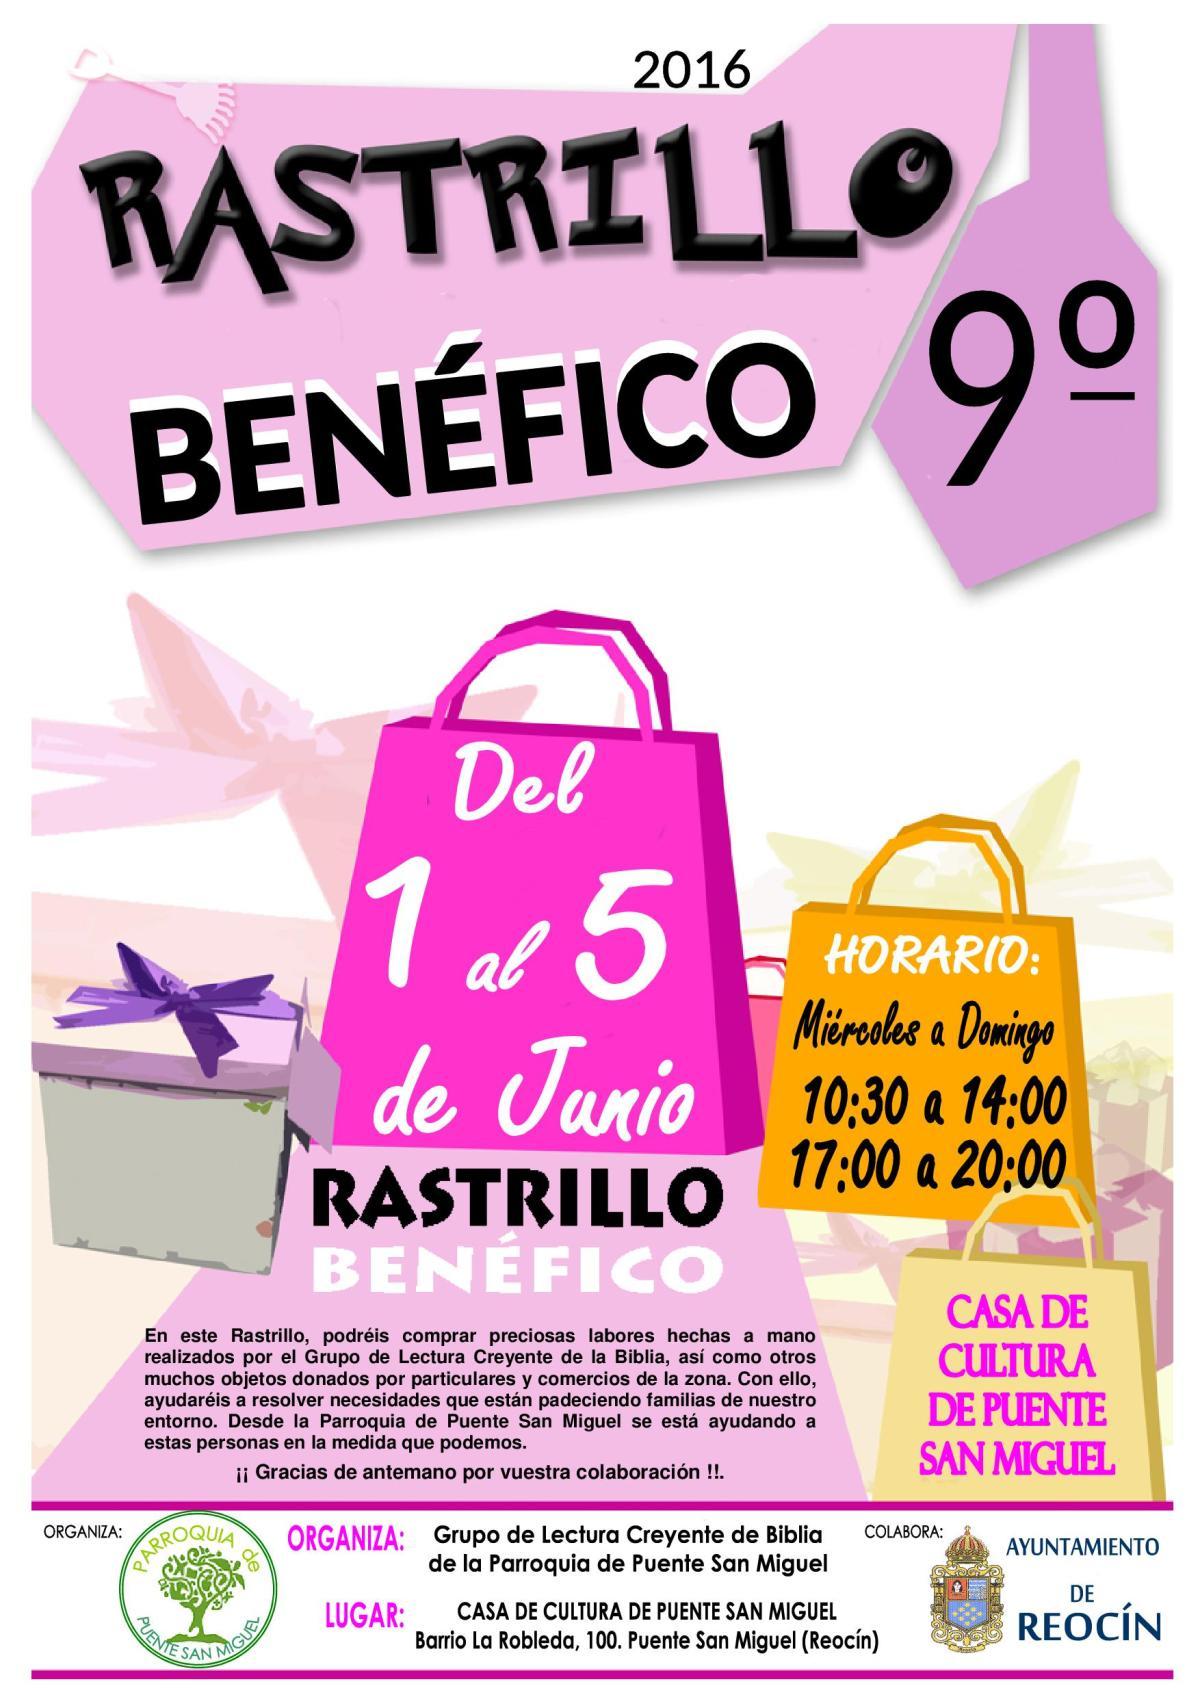 CARTEL RASTRILLO BENEFICO 2016